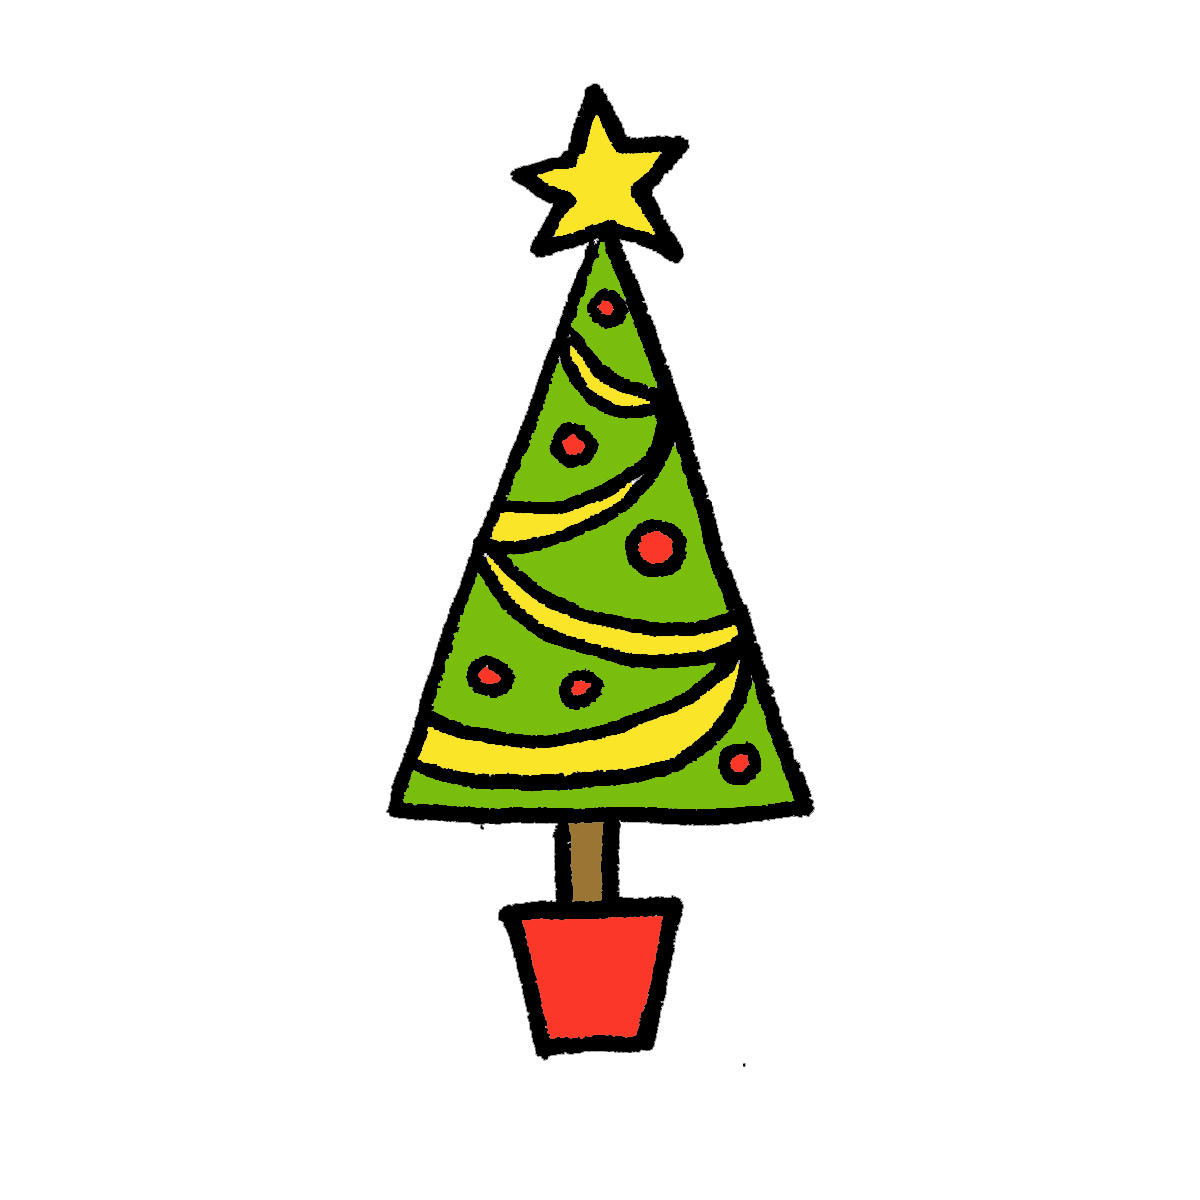 1200x1200 How To Draw A Christmas Tree 4 Cartoon Tutorials